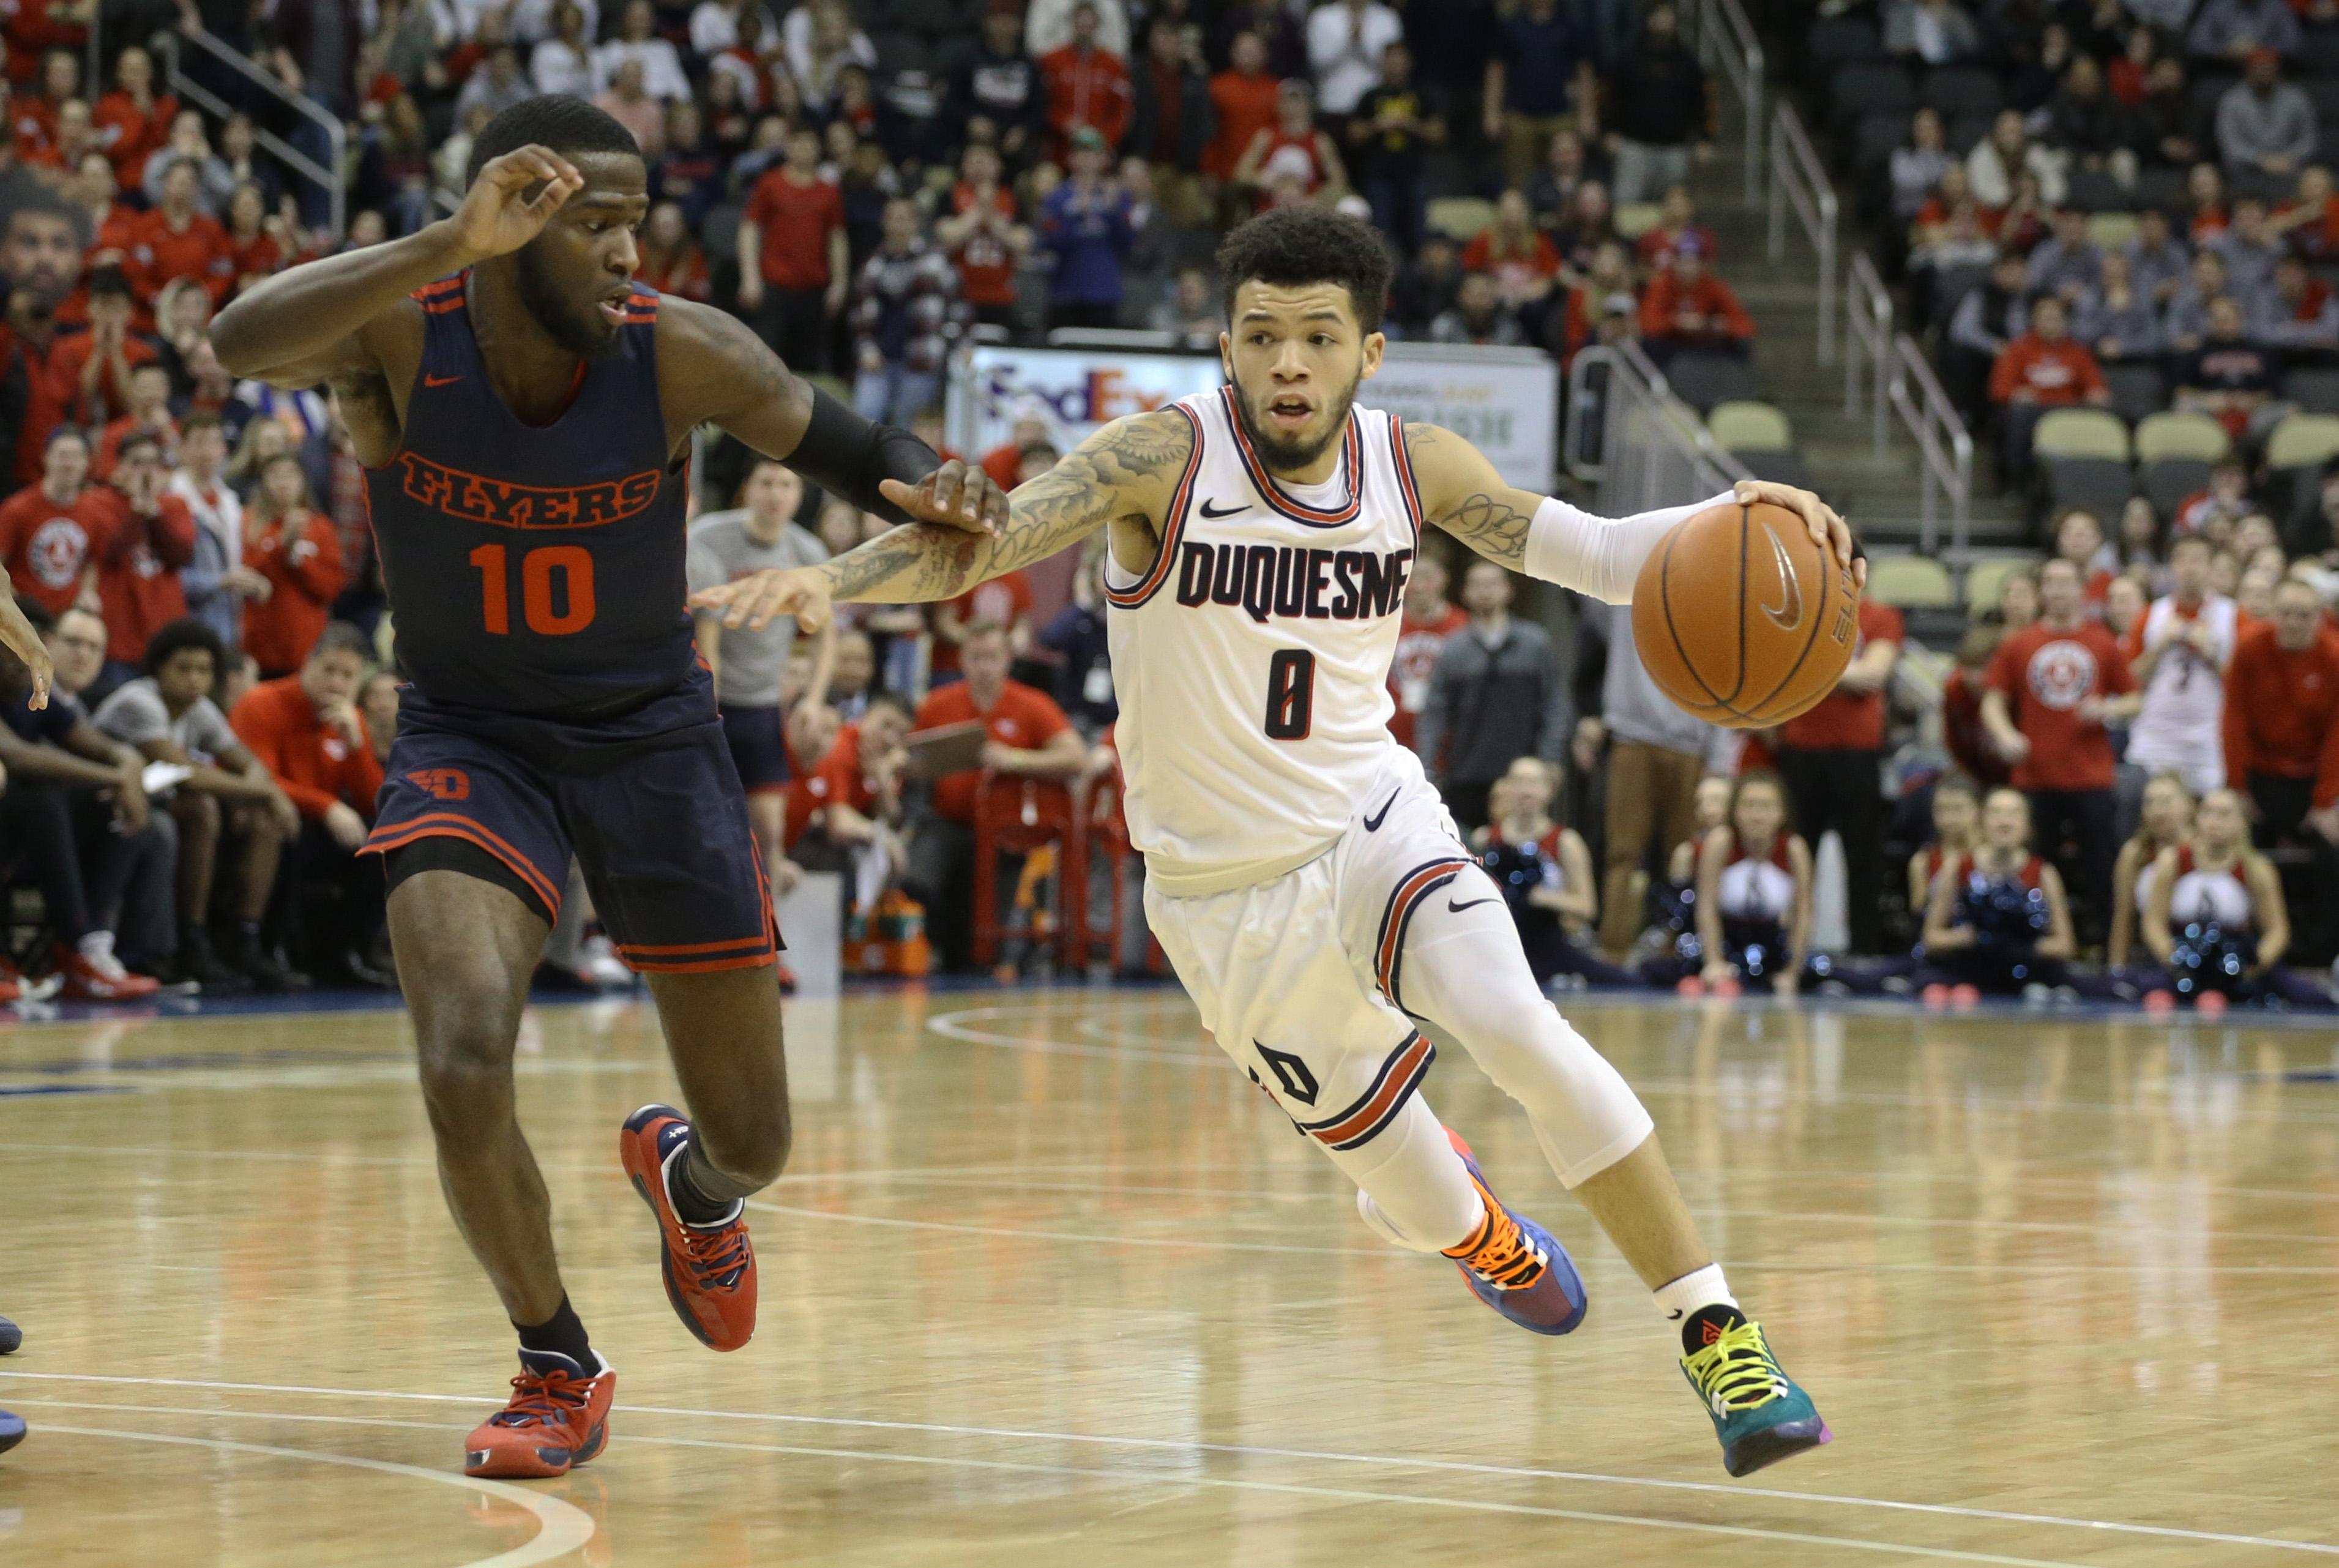 NCAA Basketball: Dayton at Duquesne